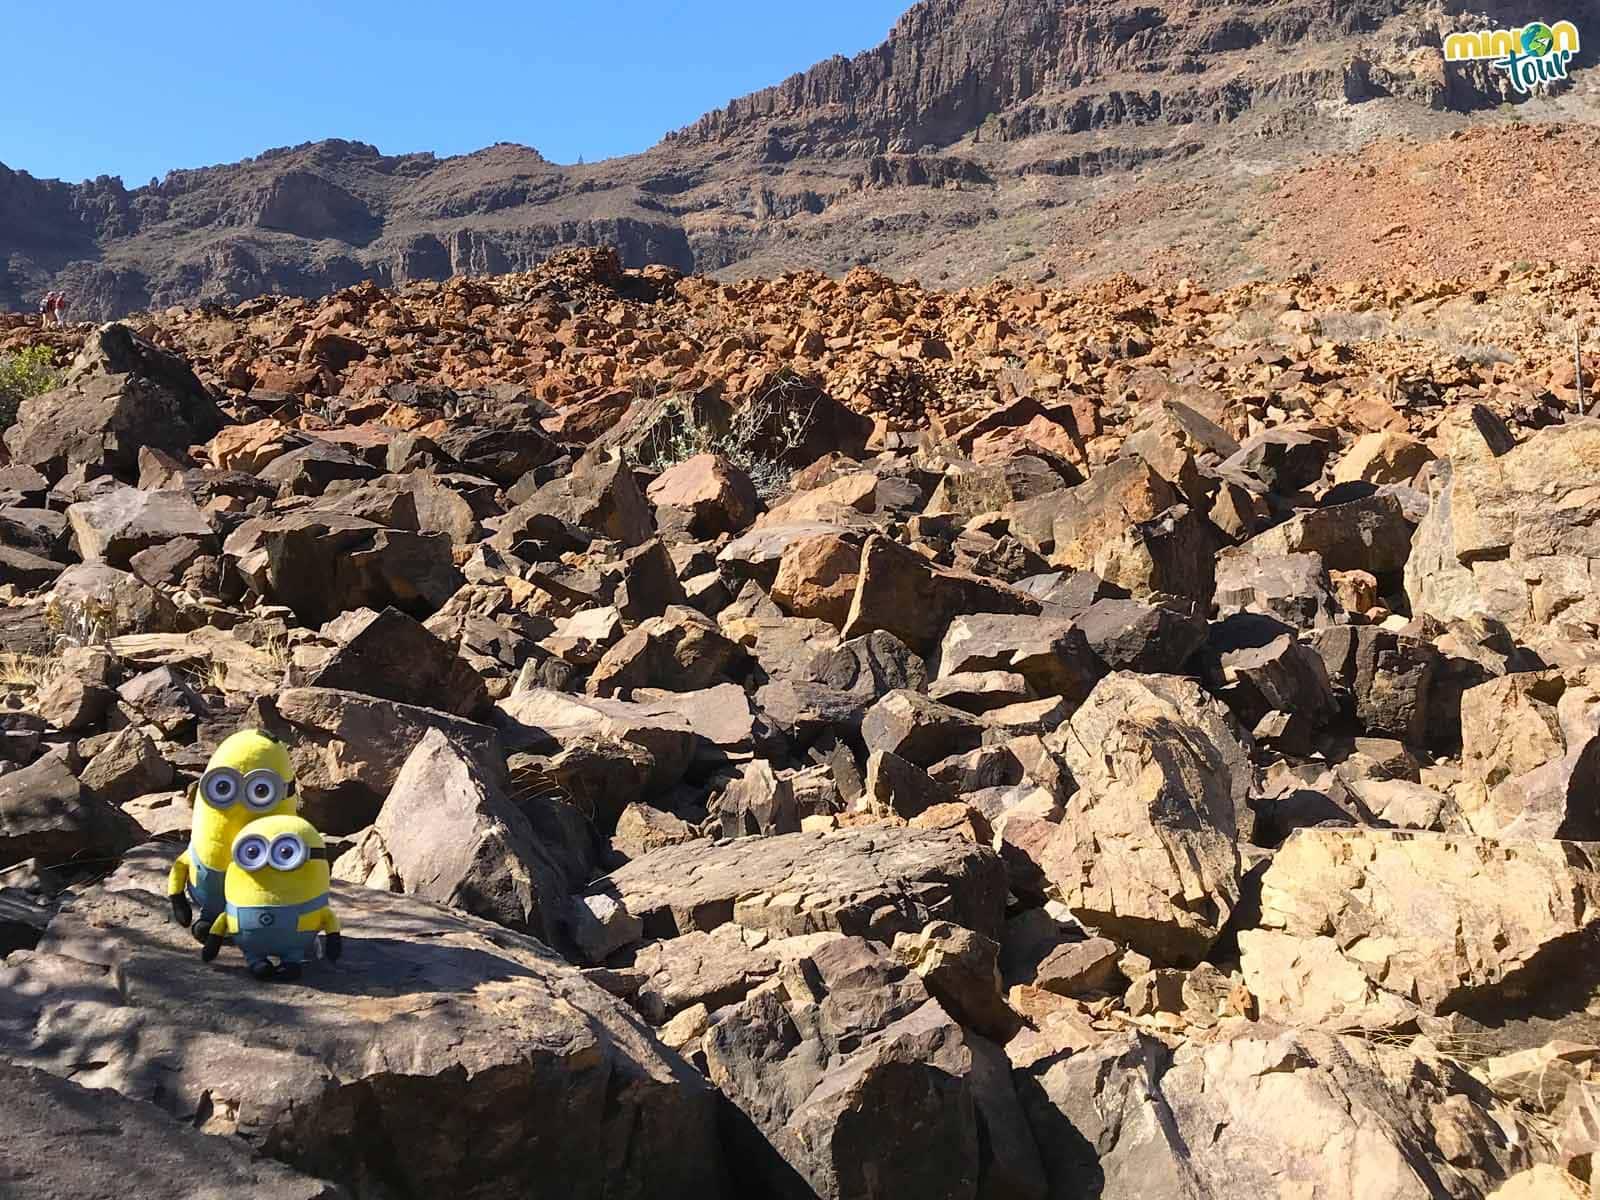 La Necrópolis de Arteara, un lugar para alucinar en Gran Canaria